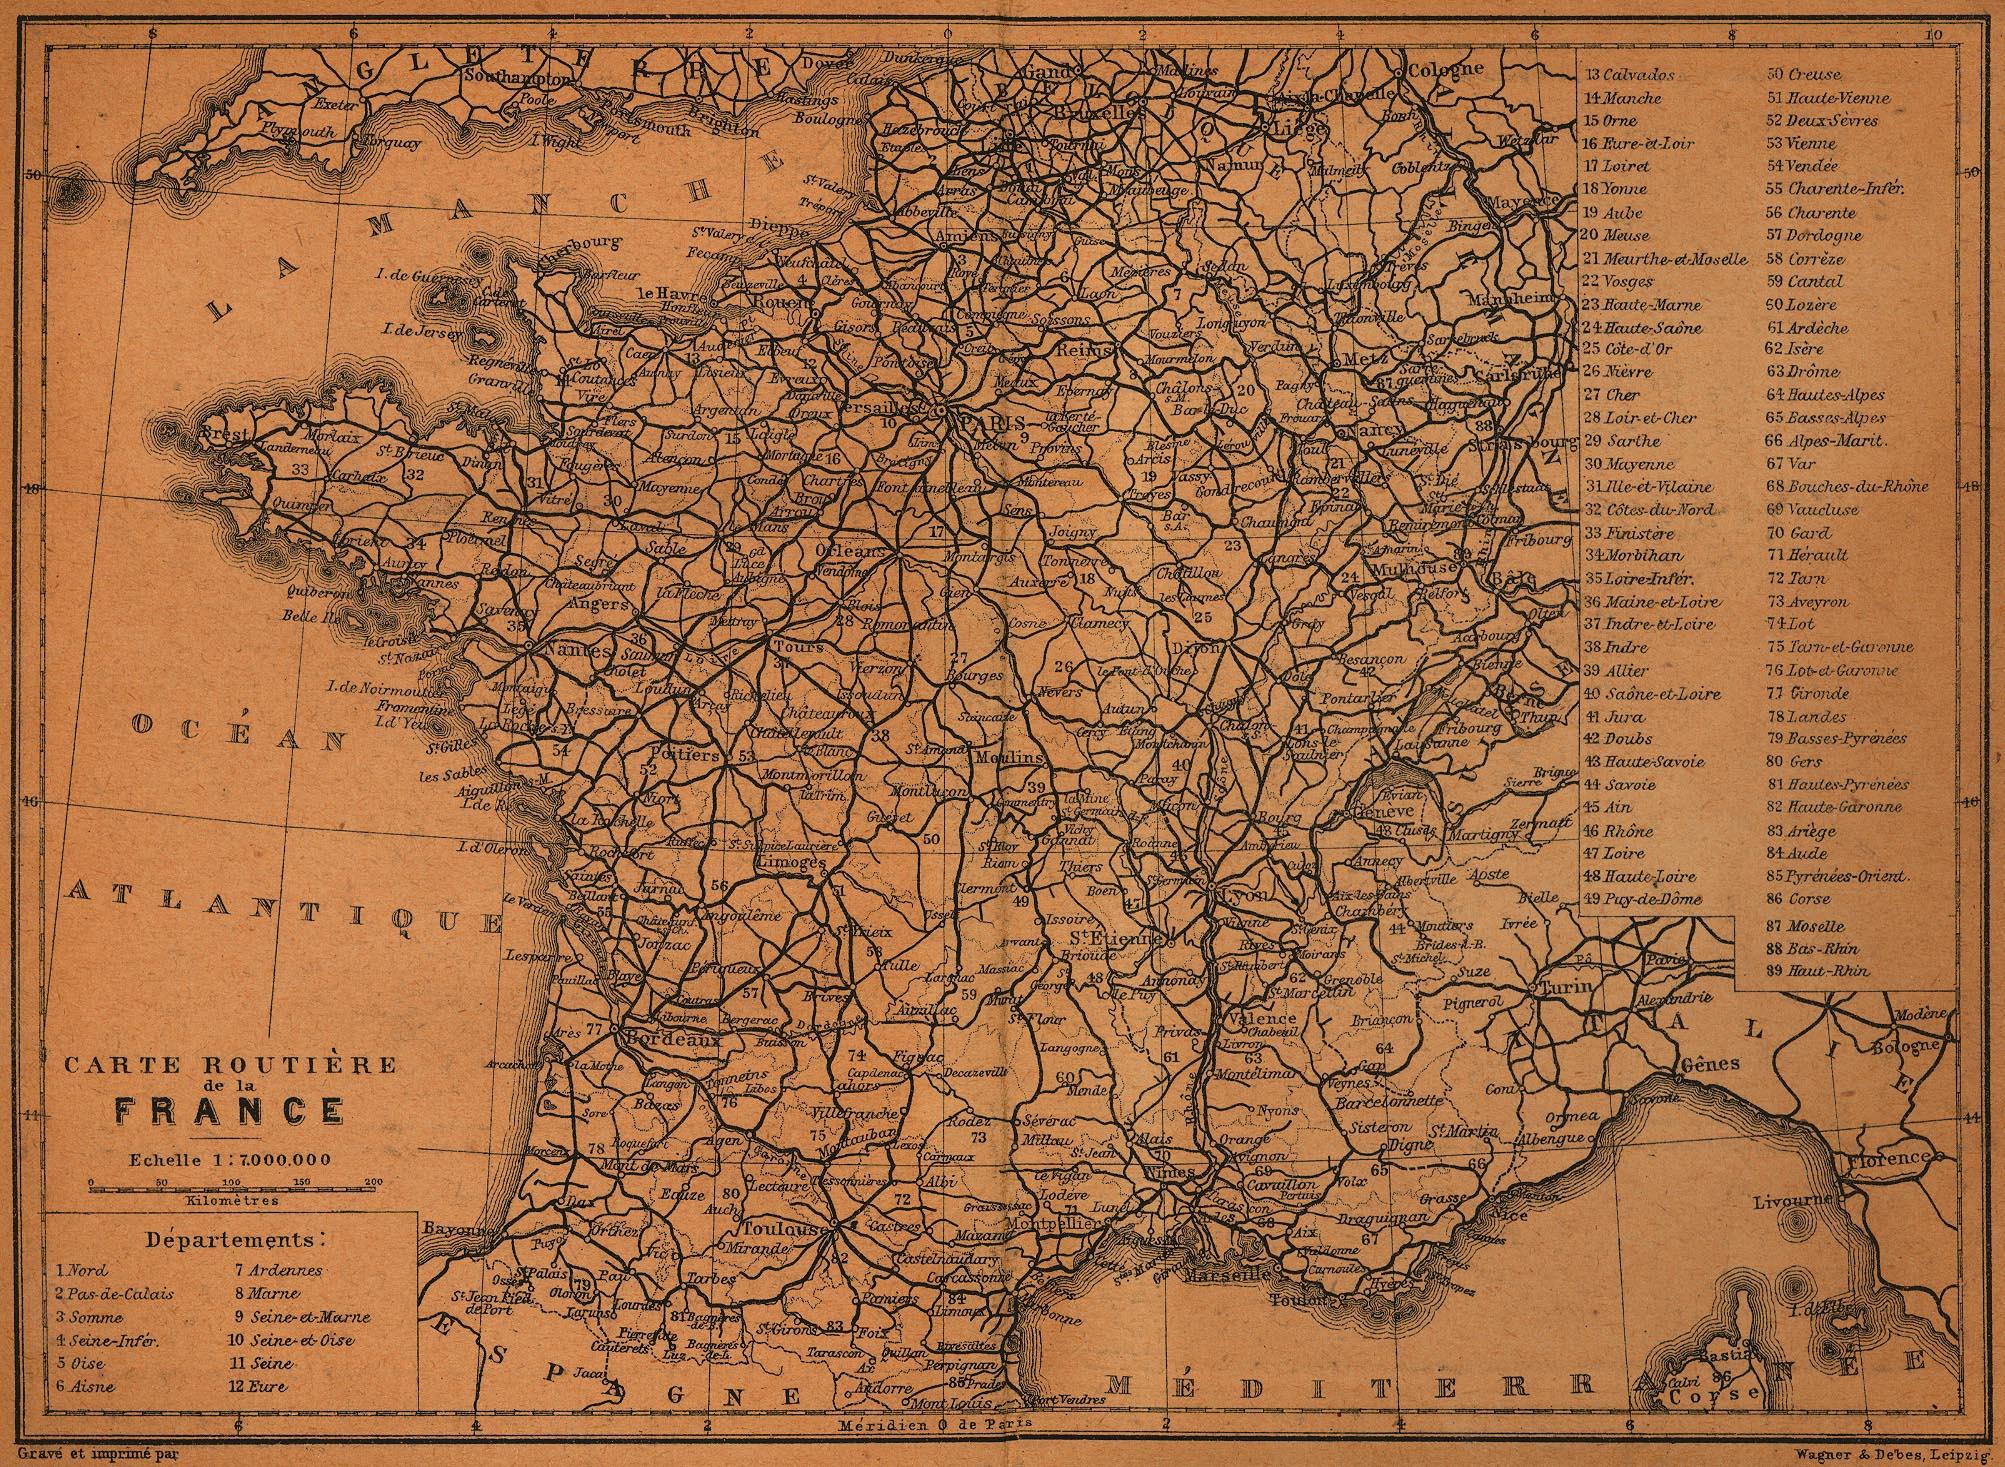 Mapa de Carreteras de Francia 1914